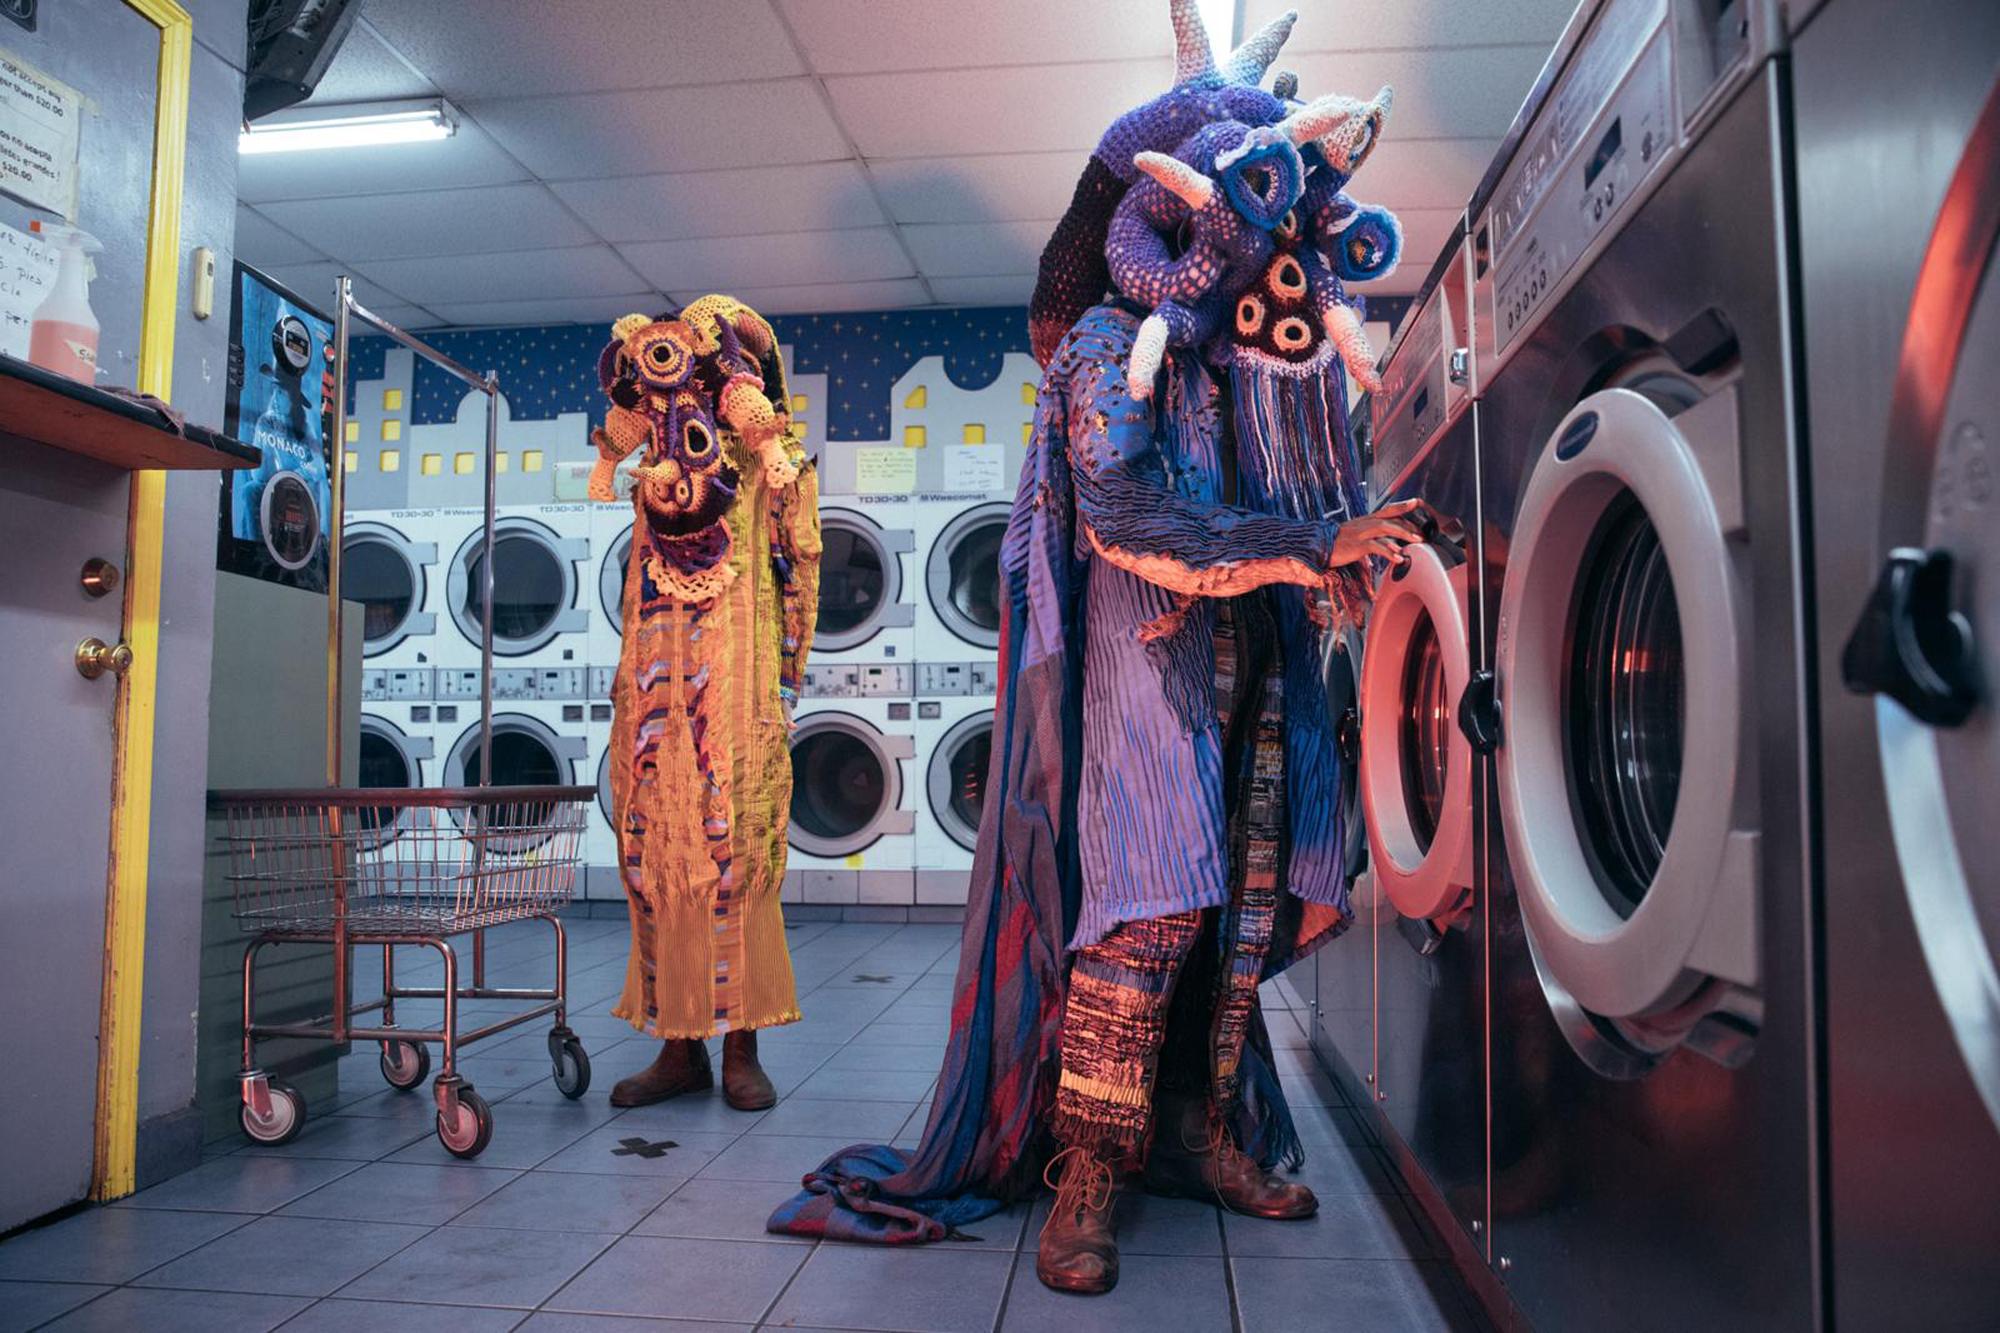 people costumes laundrymat